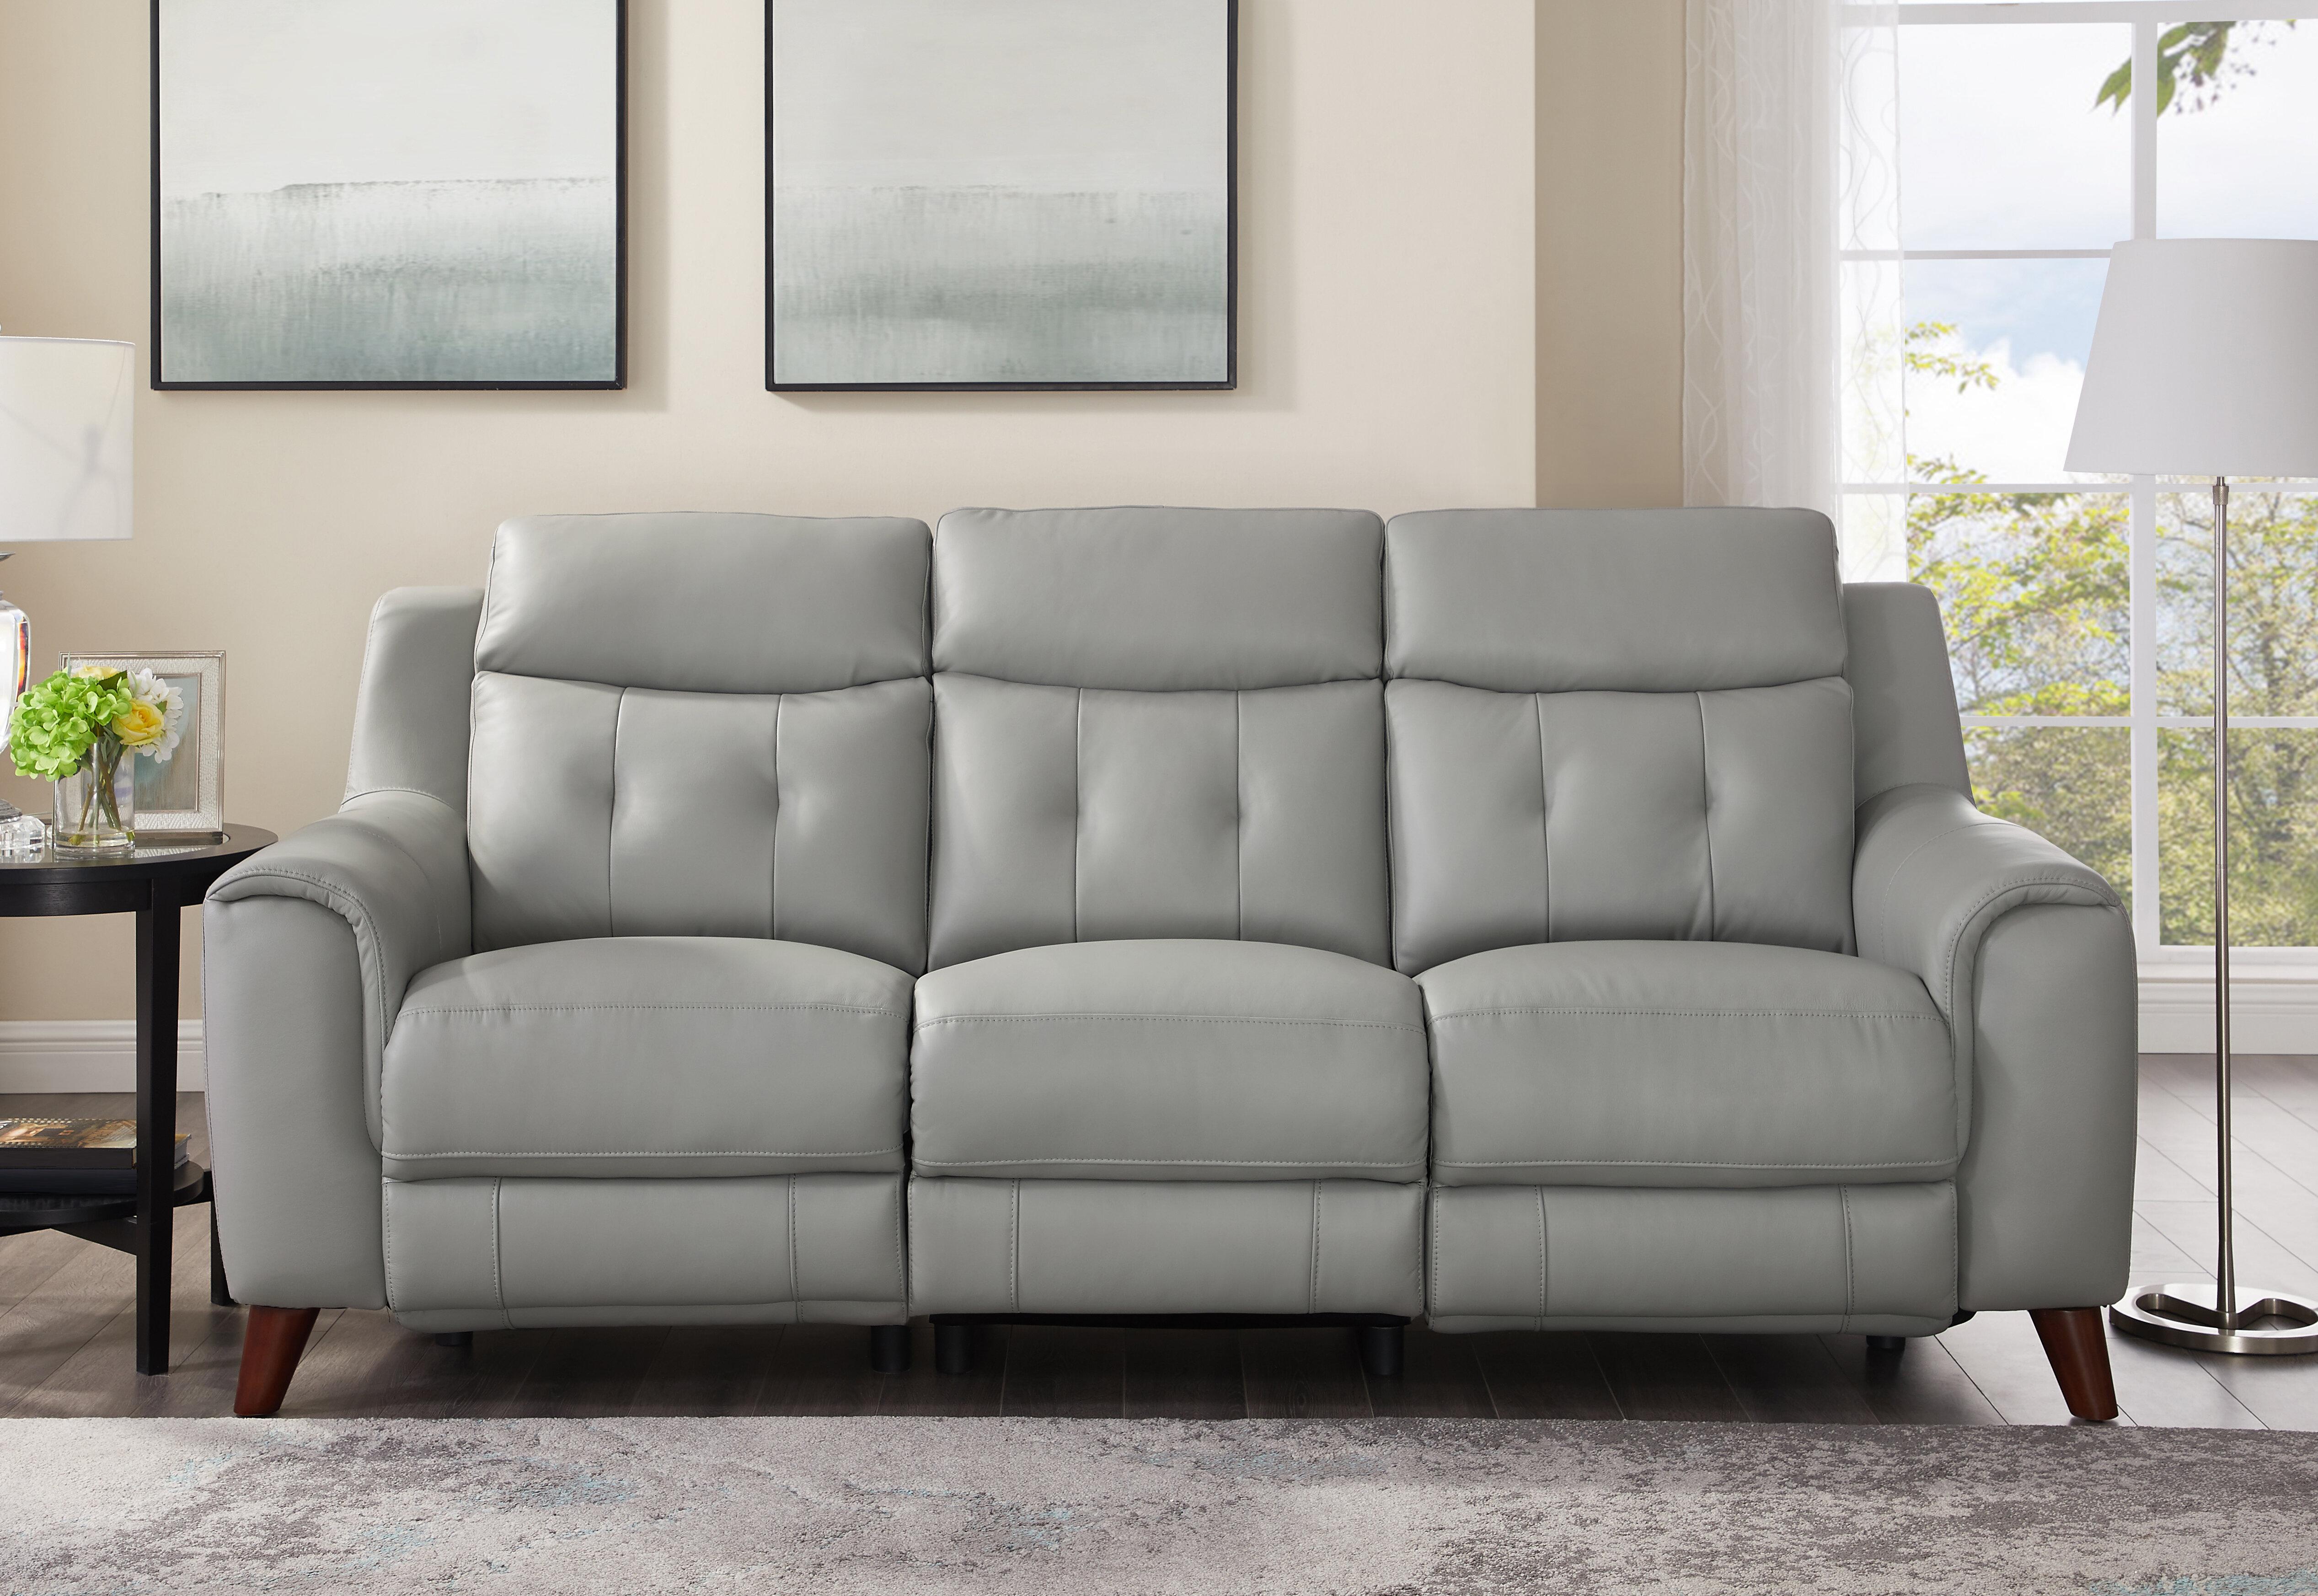 nagata leather reclining sofa